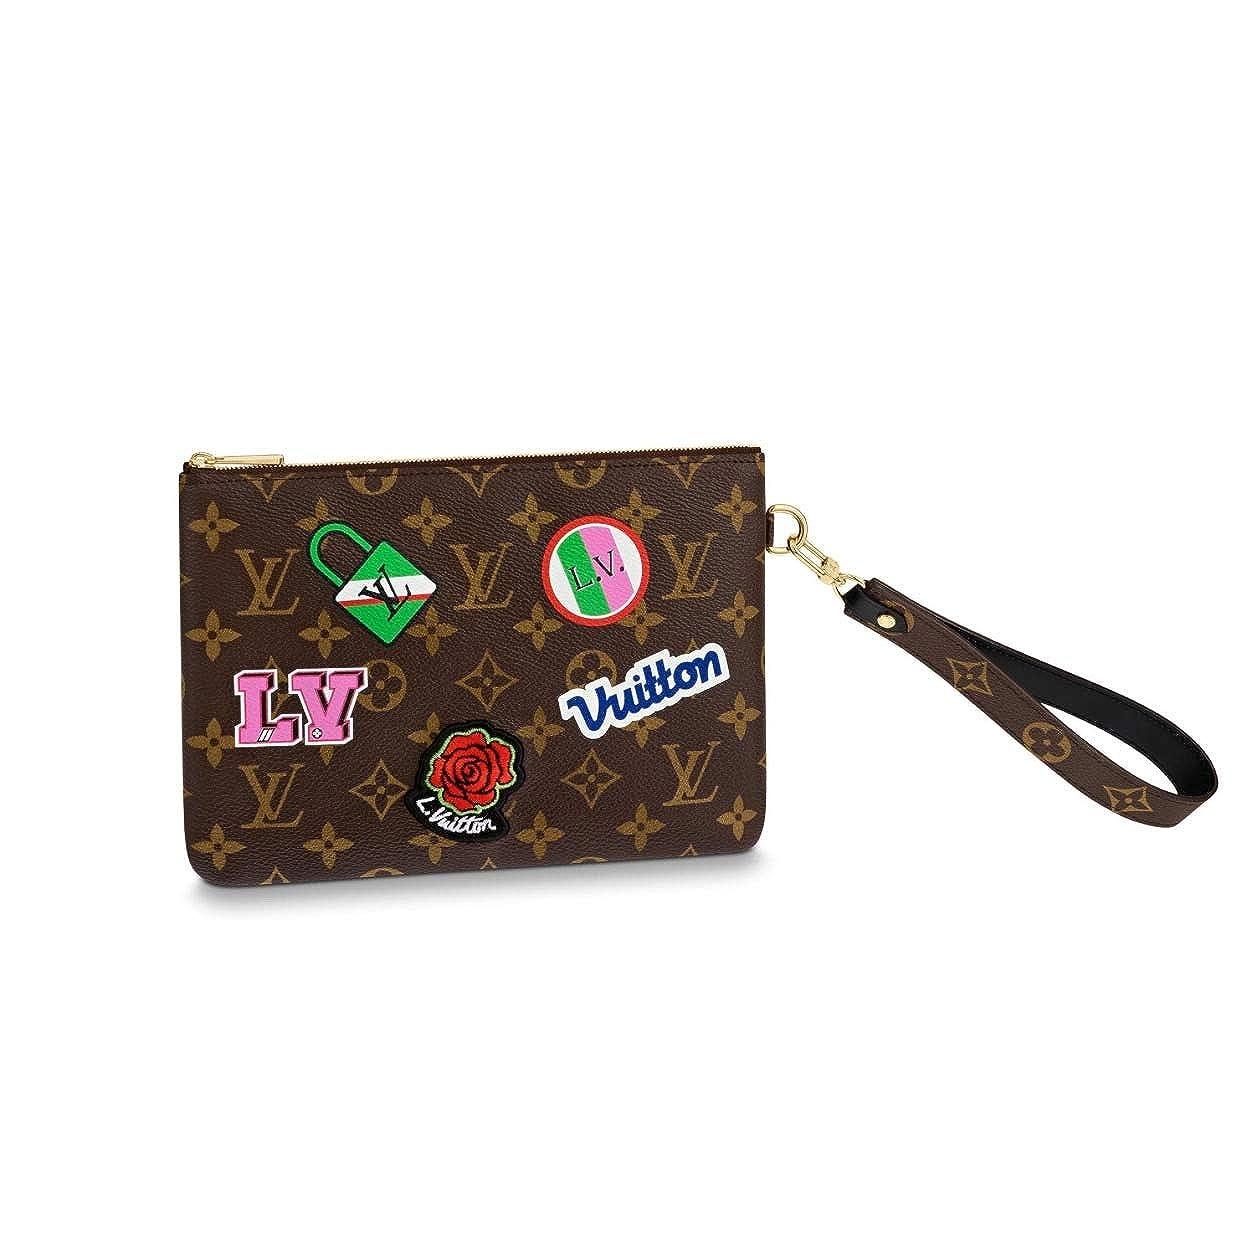 7a2f674282 Amazon.com: Louis Vuitton City Pouch M63447 Limited Edition: Clothing